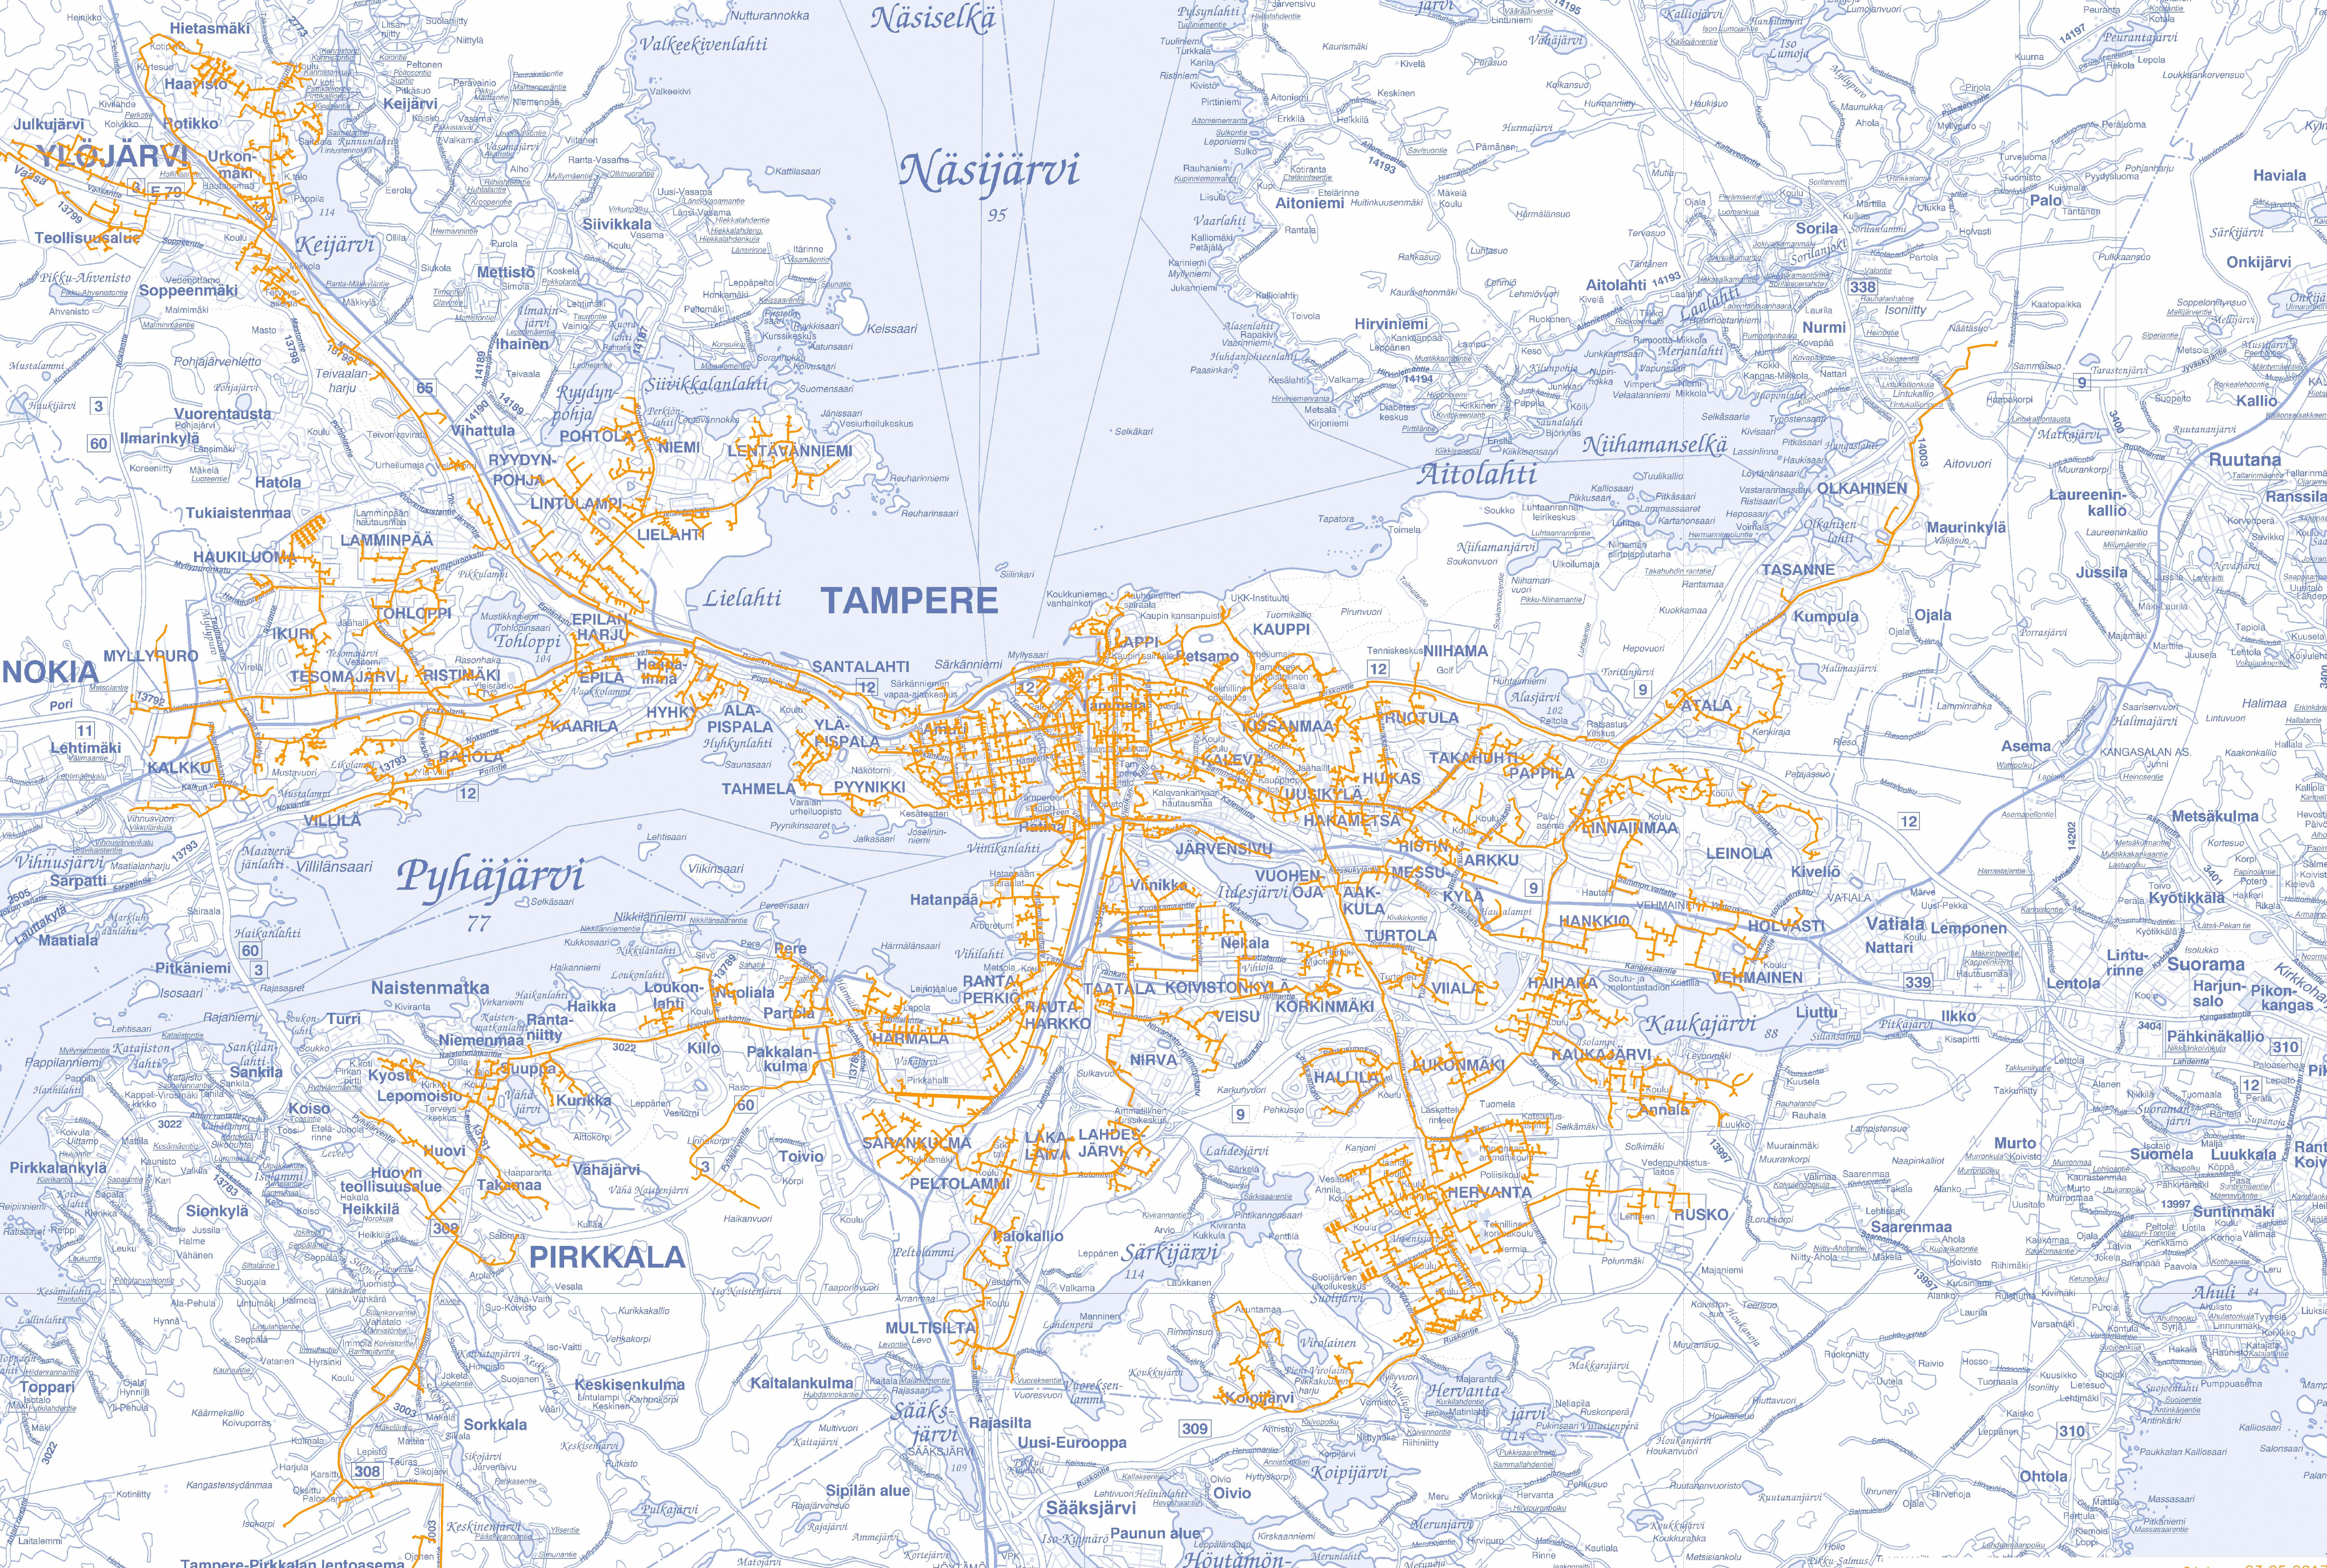 Tampereen Sahkolaitos Kaukolampoverkko Tampereen Sahkolaitos